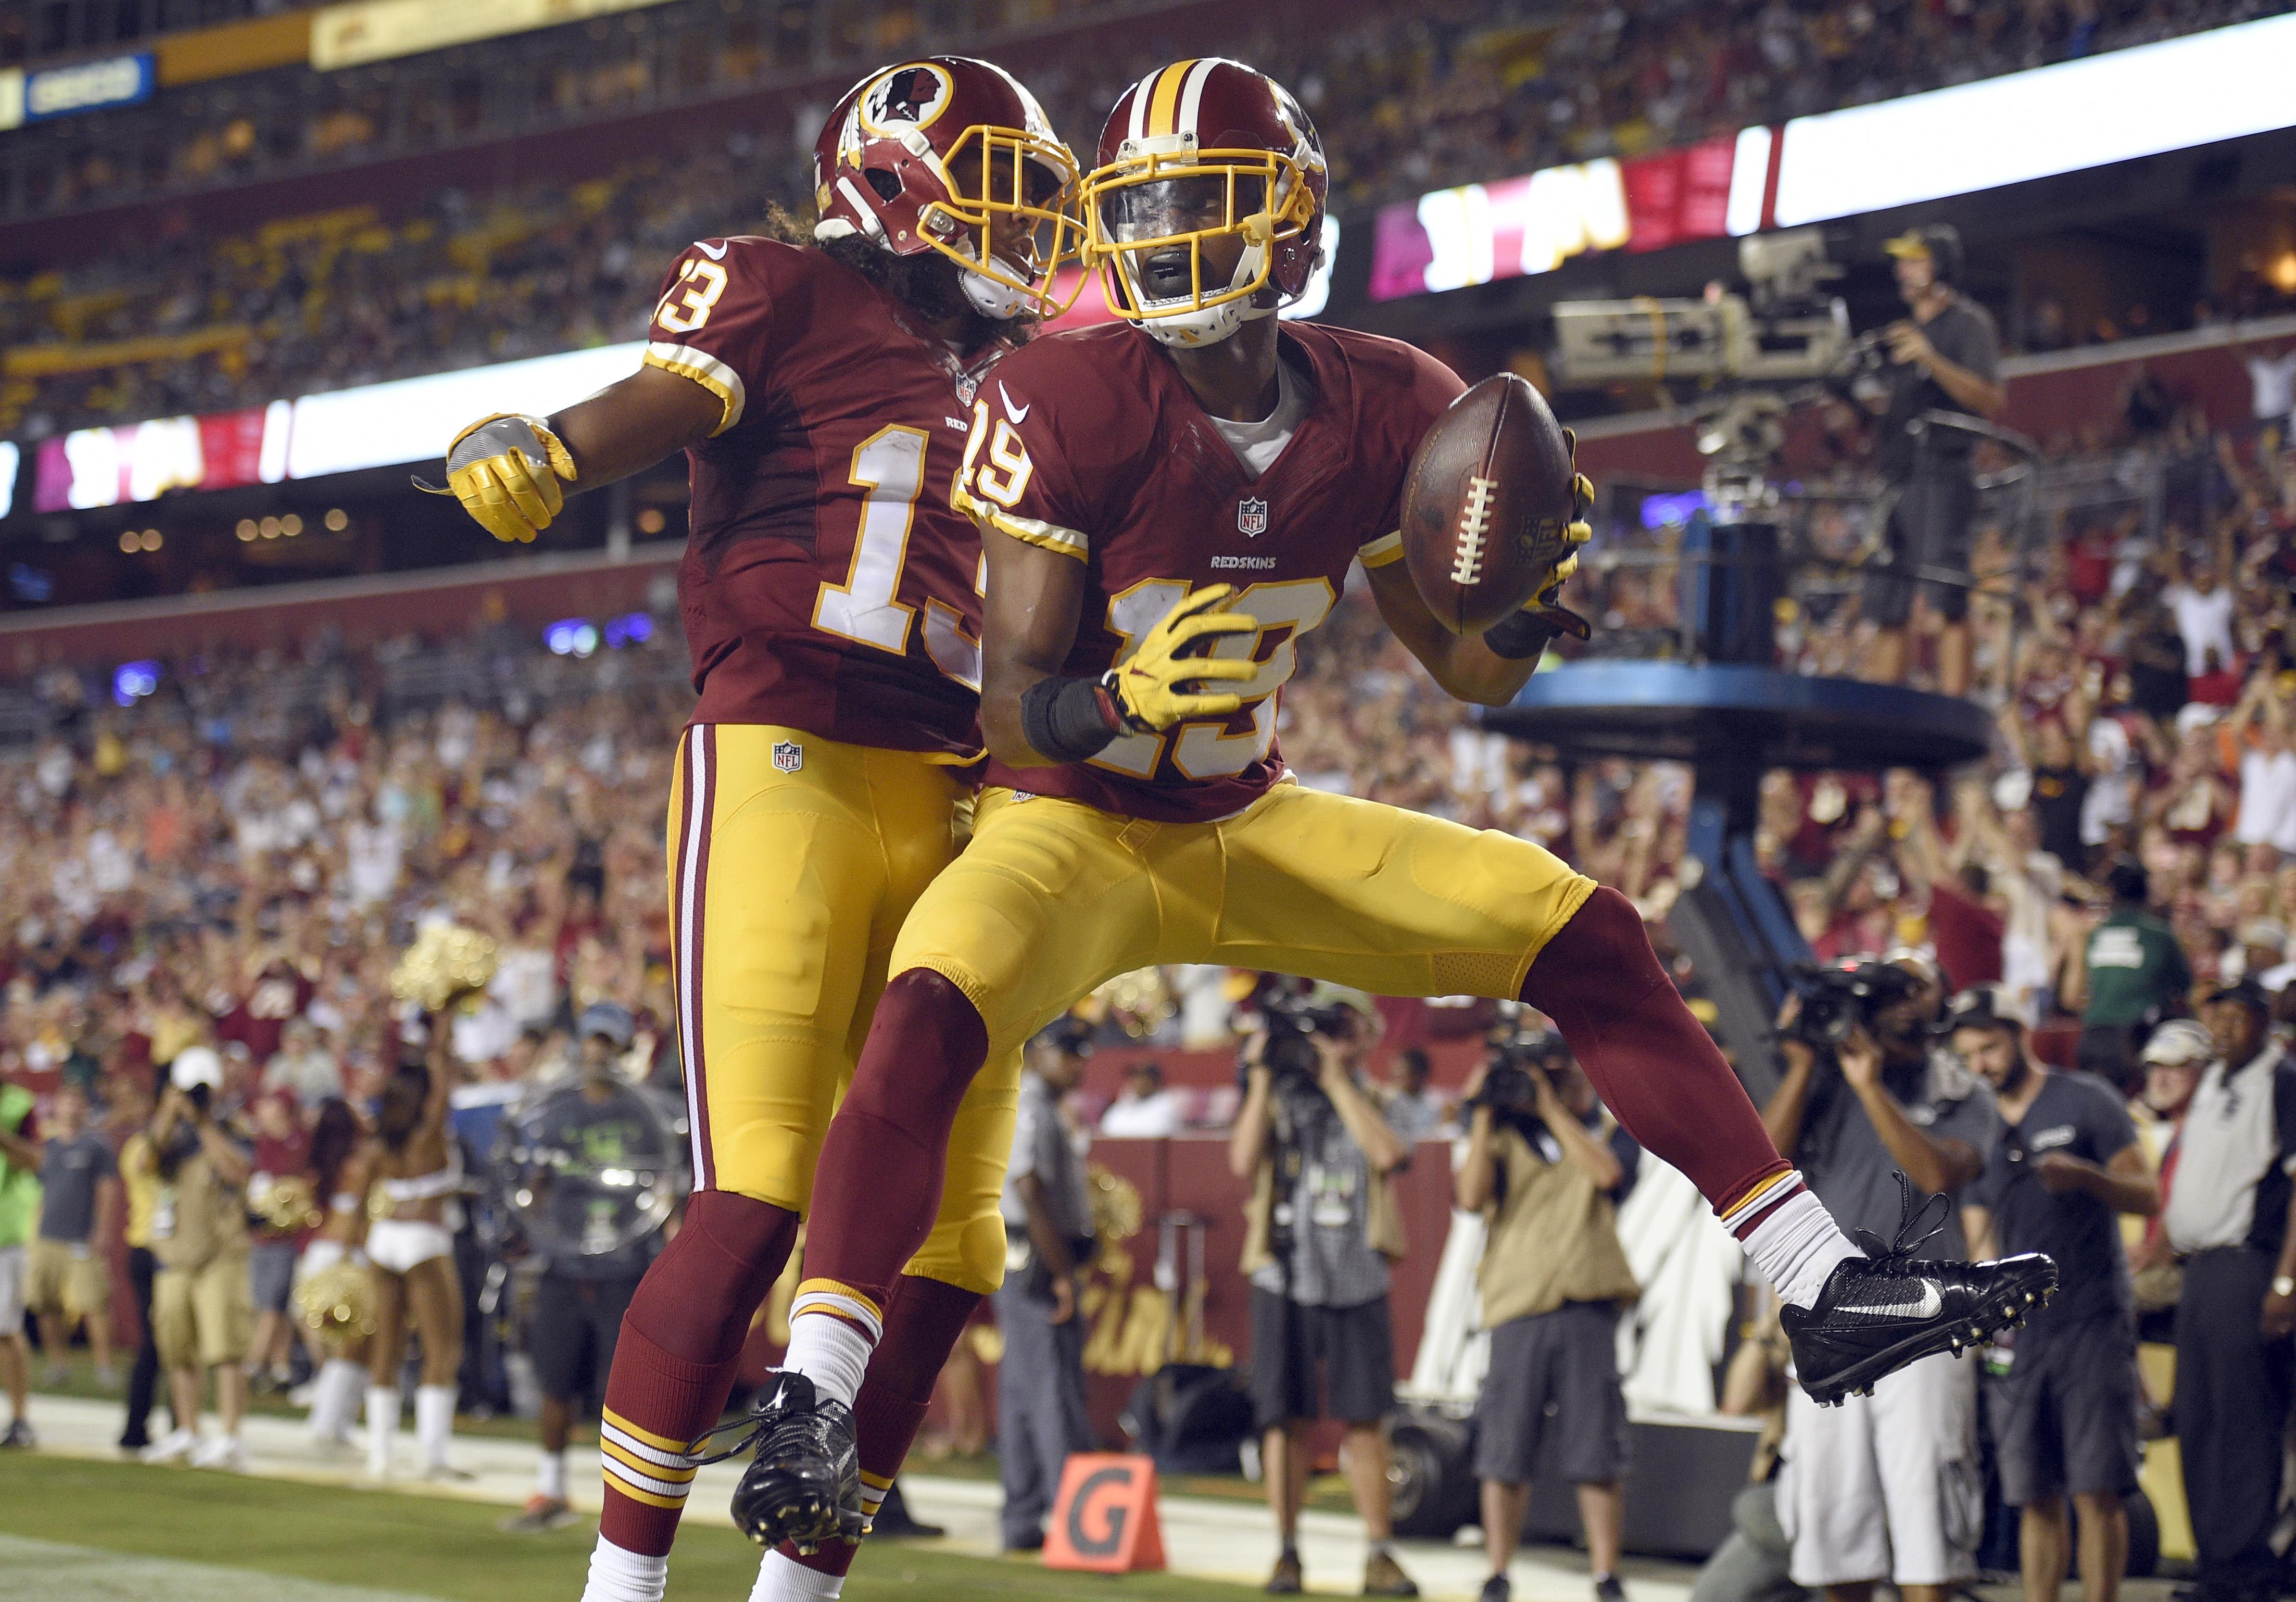 Nike jerseys for Cheap - Special Section - Washington Redskins 2016 - Washington Times